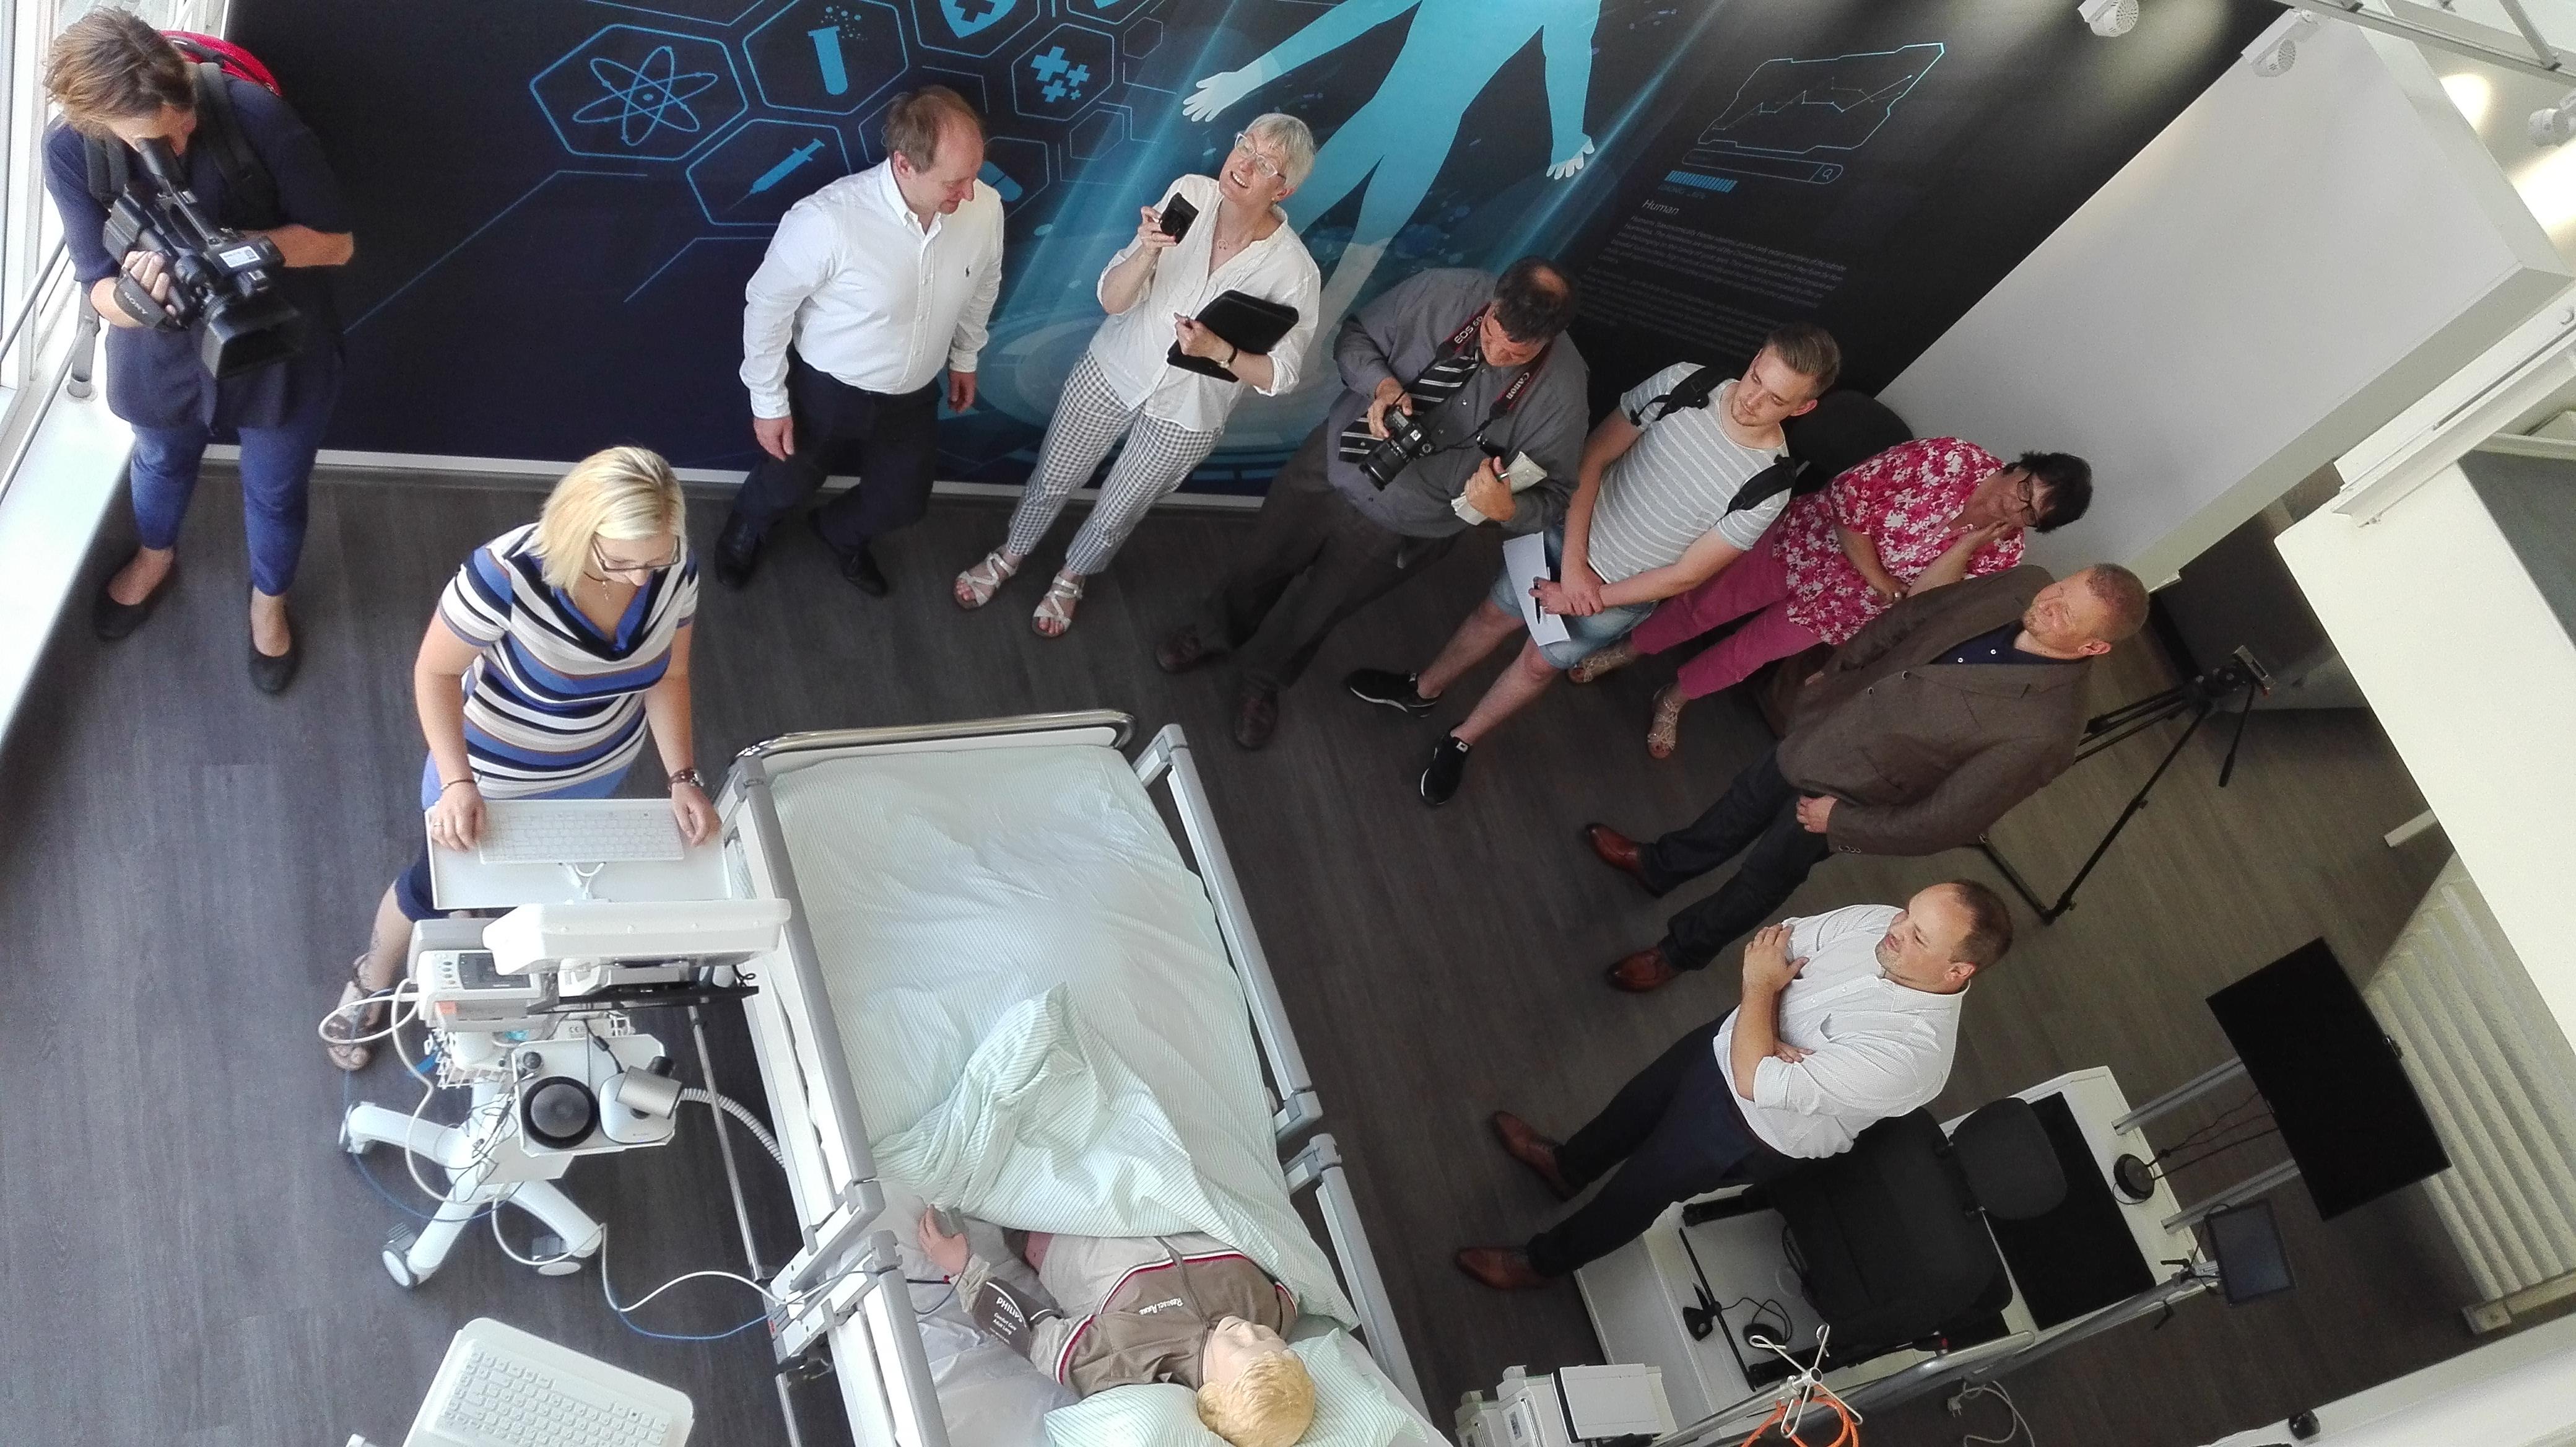 Dr. Raphael Walocha (2. v. rechts), Eveline Moll (3. v. rechts) und Nancy Heizmann (2. v. links) bei der Pressevorstellung des Pilotprojekts.